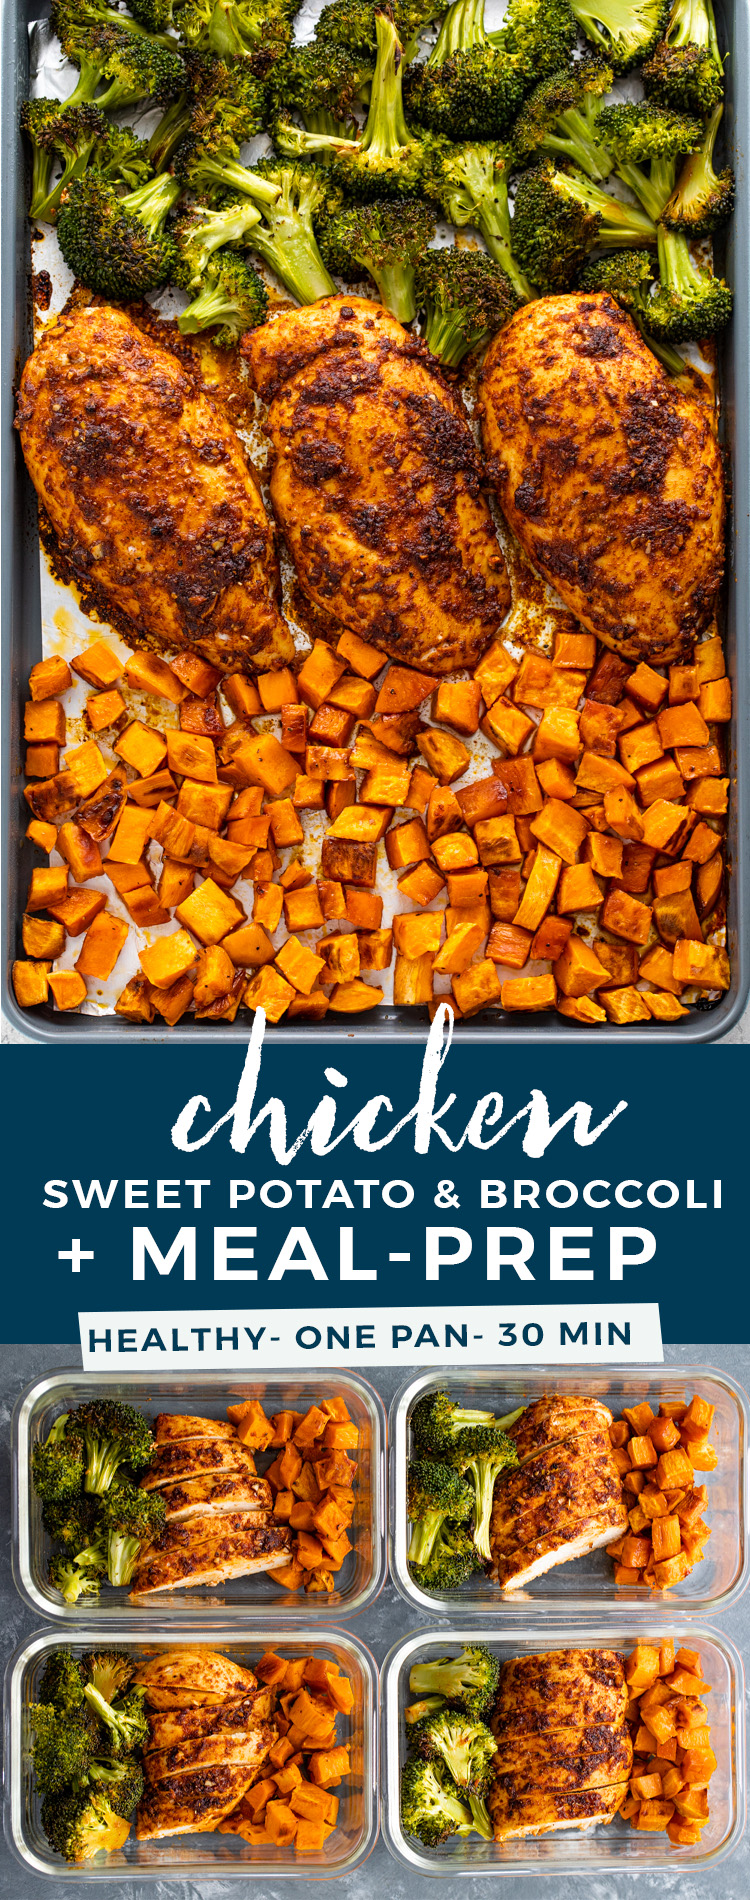 Sheet Pan Roasted Chicken, Sweet Potatoes, & Broccoli + Meal Prep